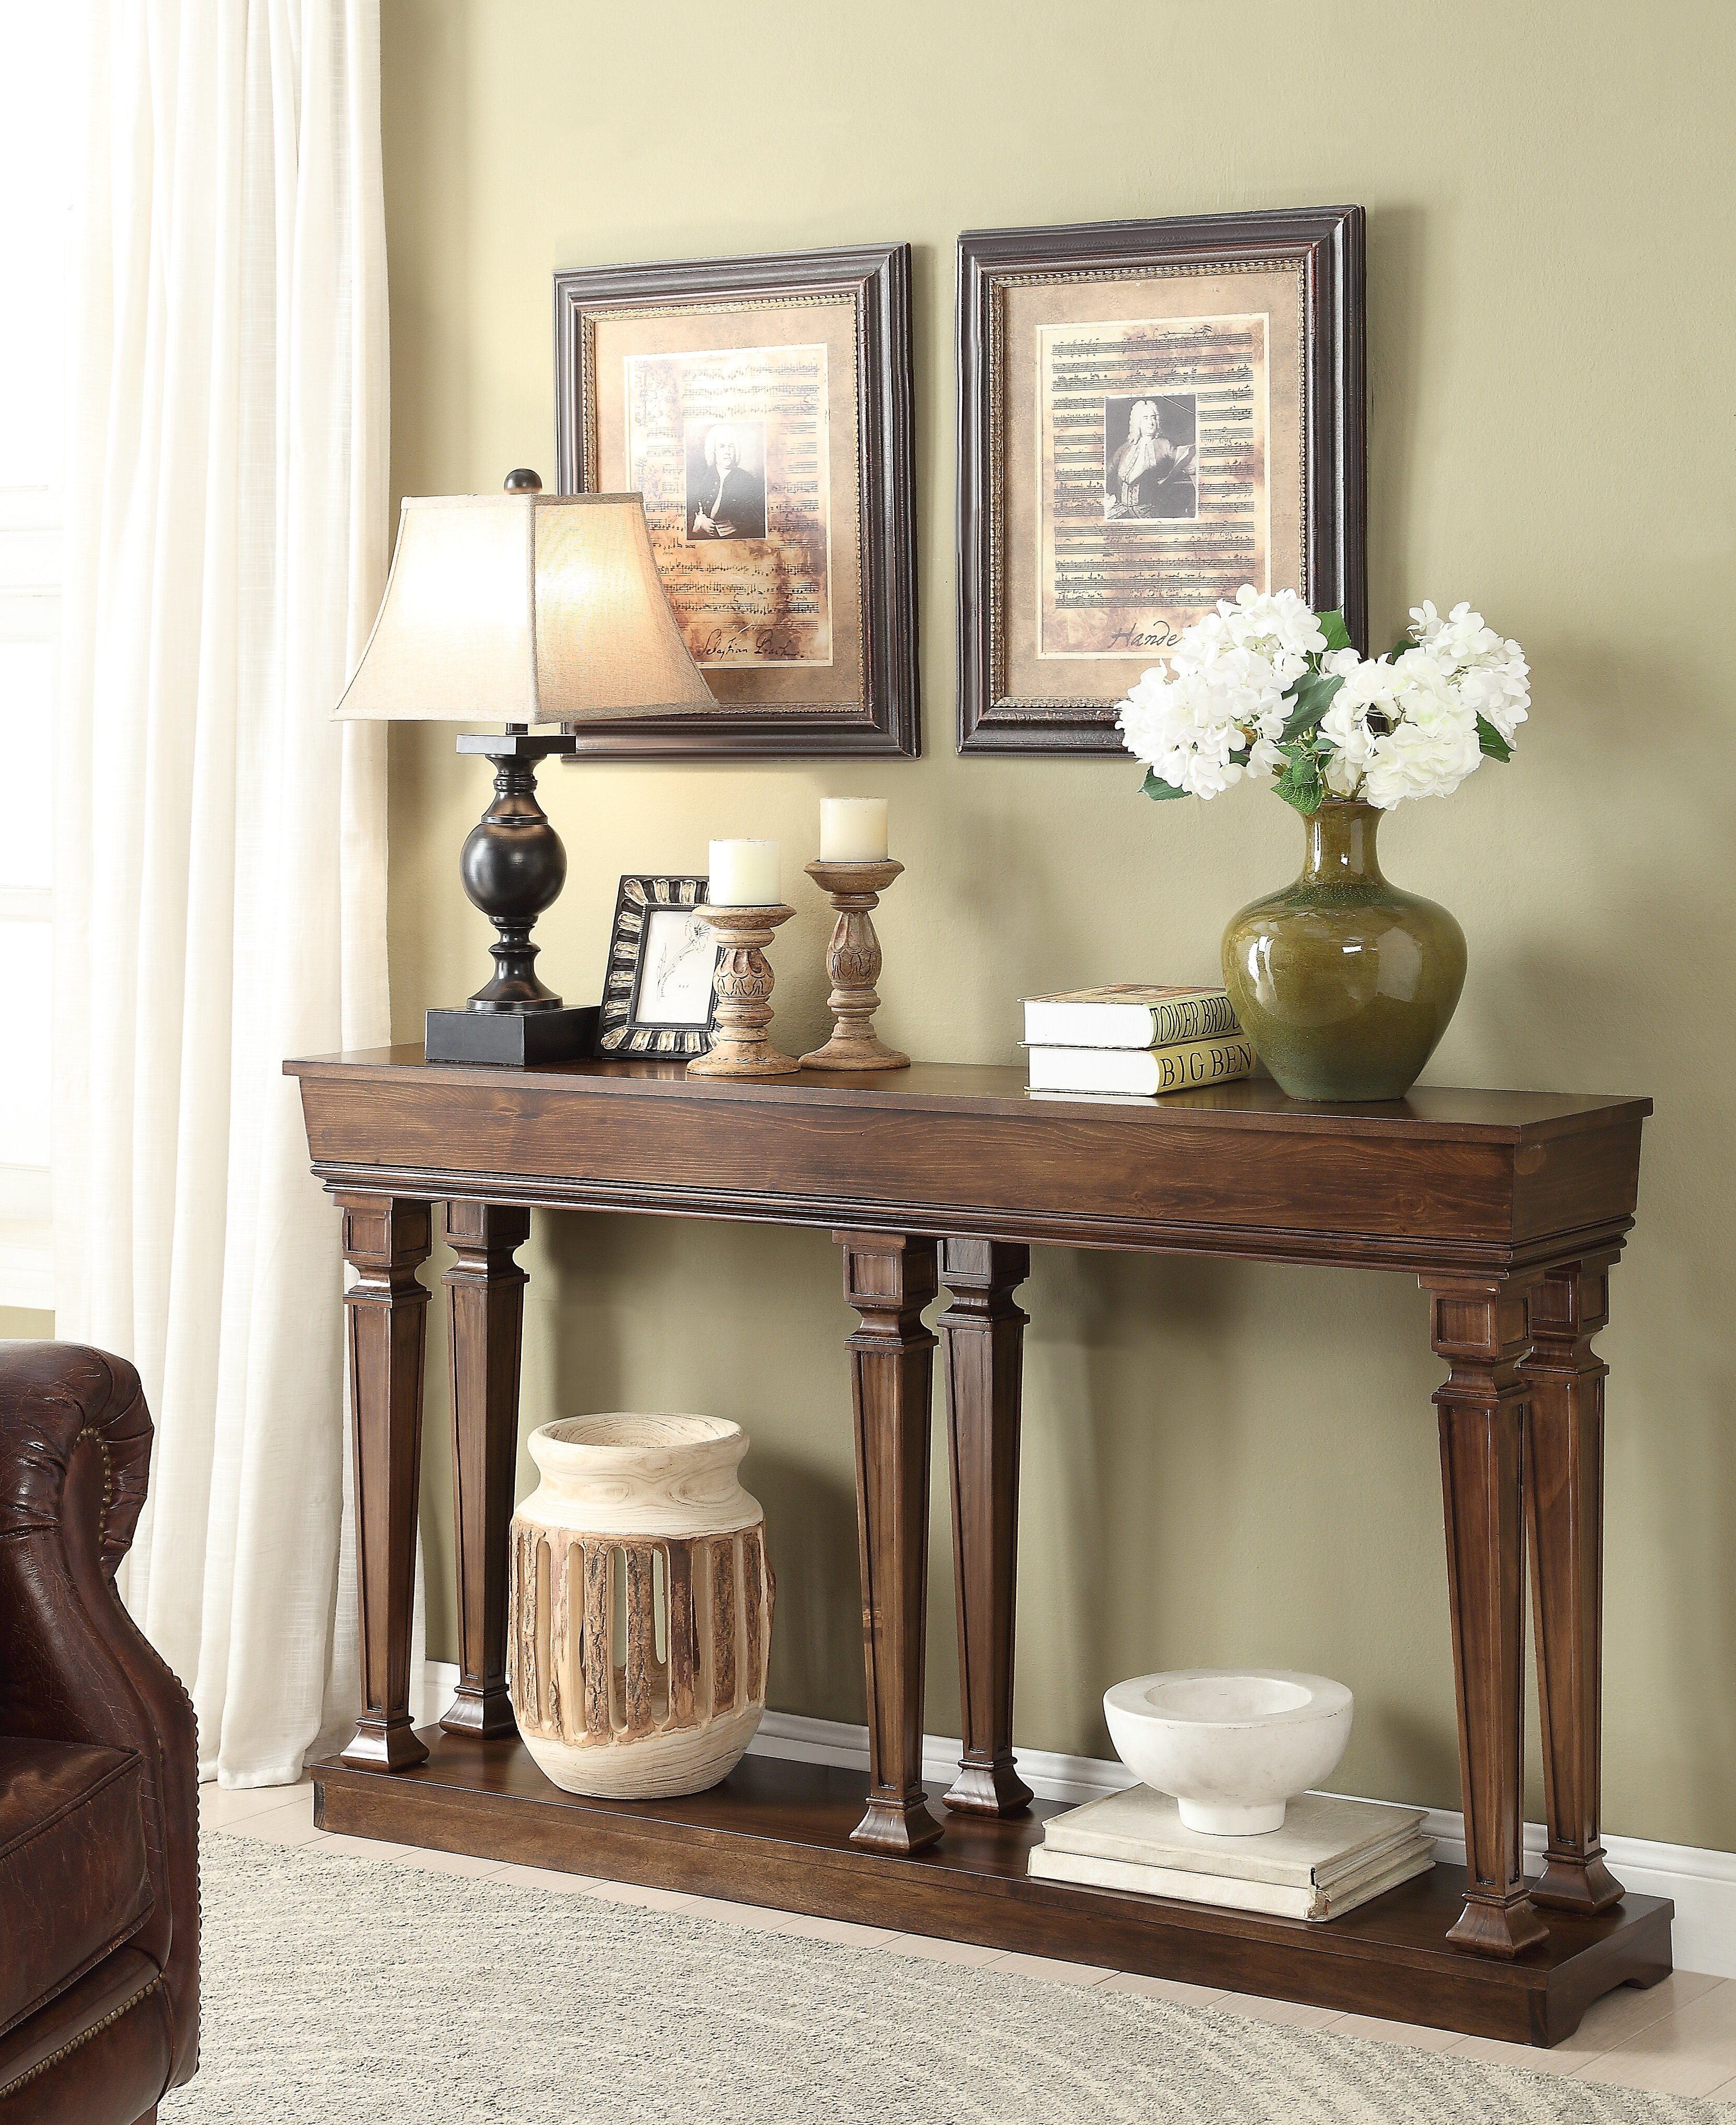 ACME Furniture Garrison Console Table U0026 Reviews | Wayfair